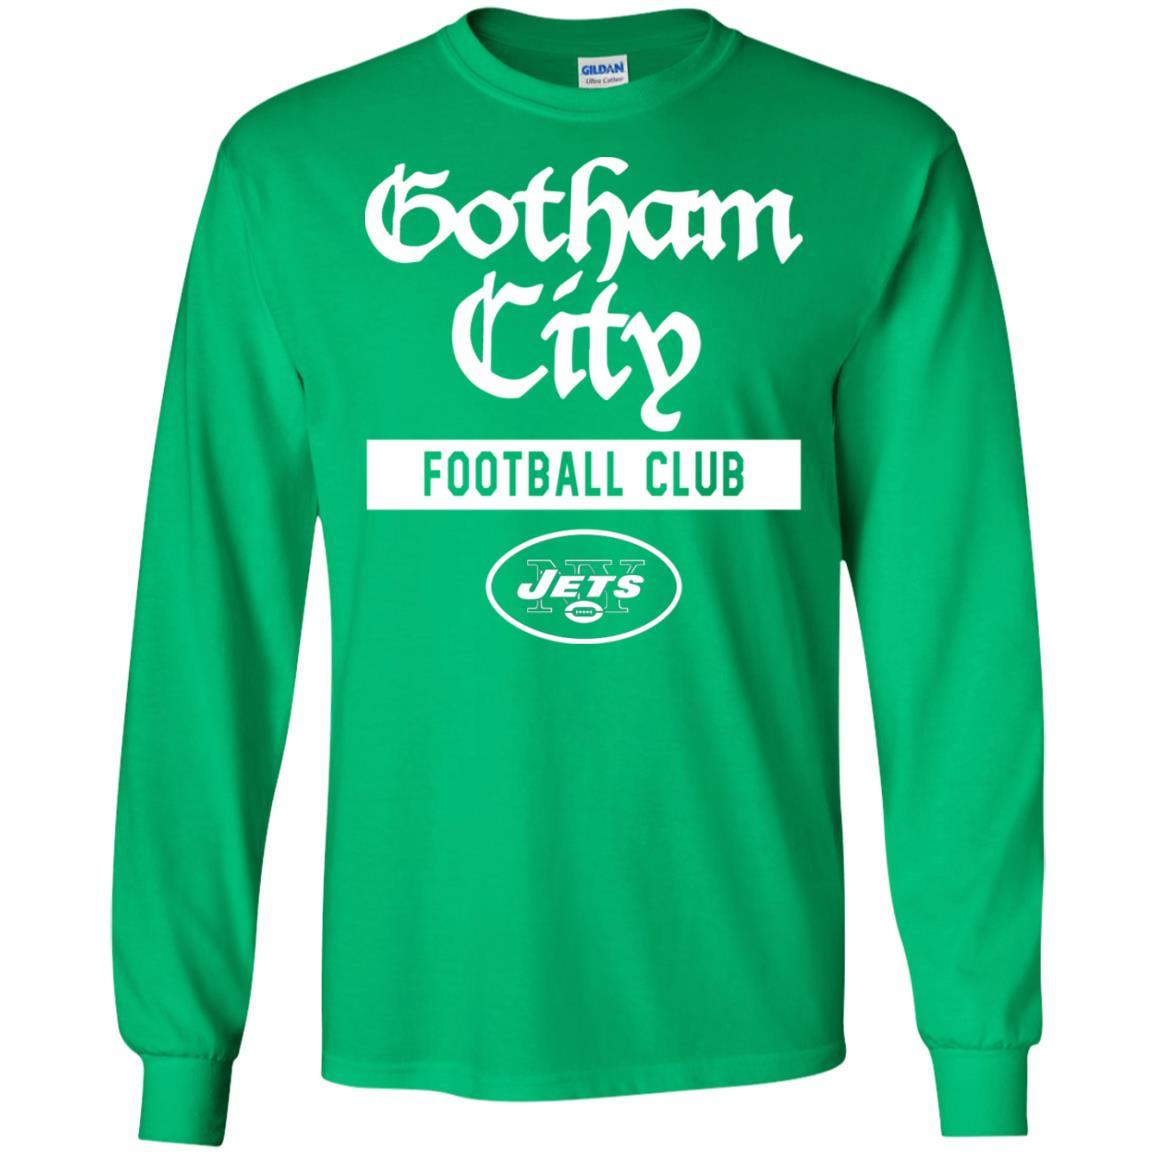 Image result for gotham city football shirt pics